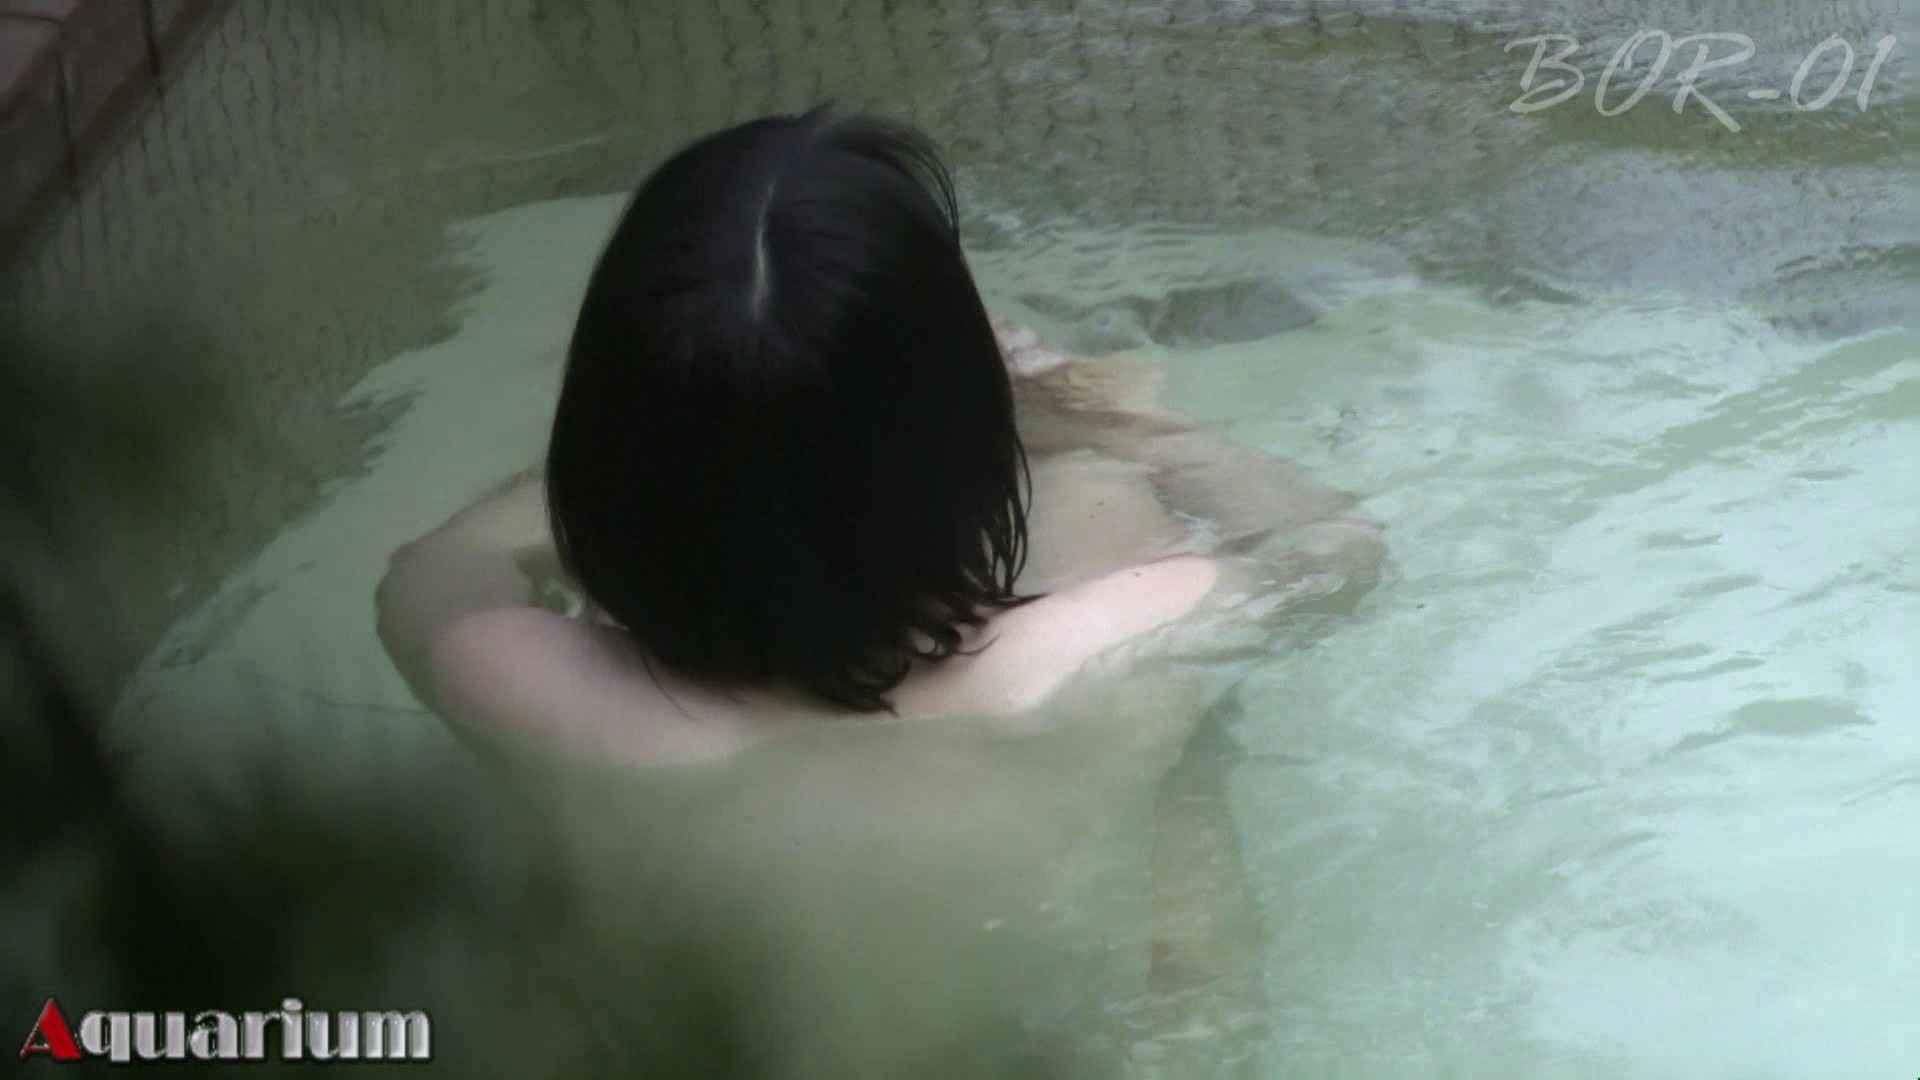 Aquaな露天風呂Vol.466 OLのエロ生活 オマンコ動画キャプチャ 72連発 29